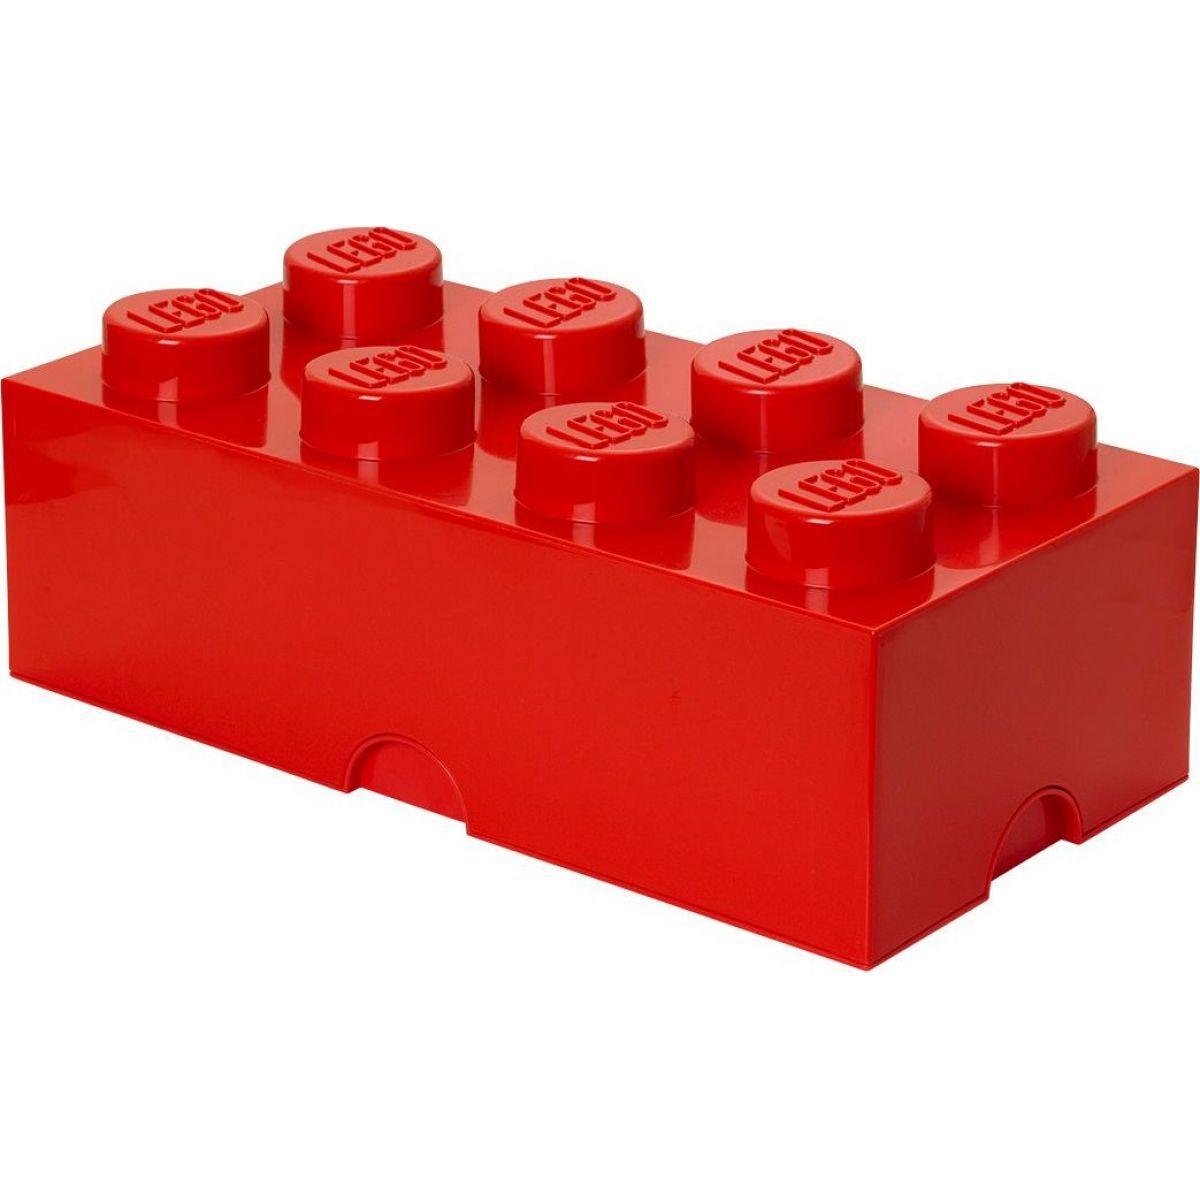 LEGO Box na svačinu 10 x 20 x 7,5 cm Červená